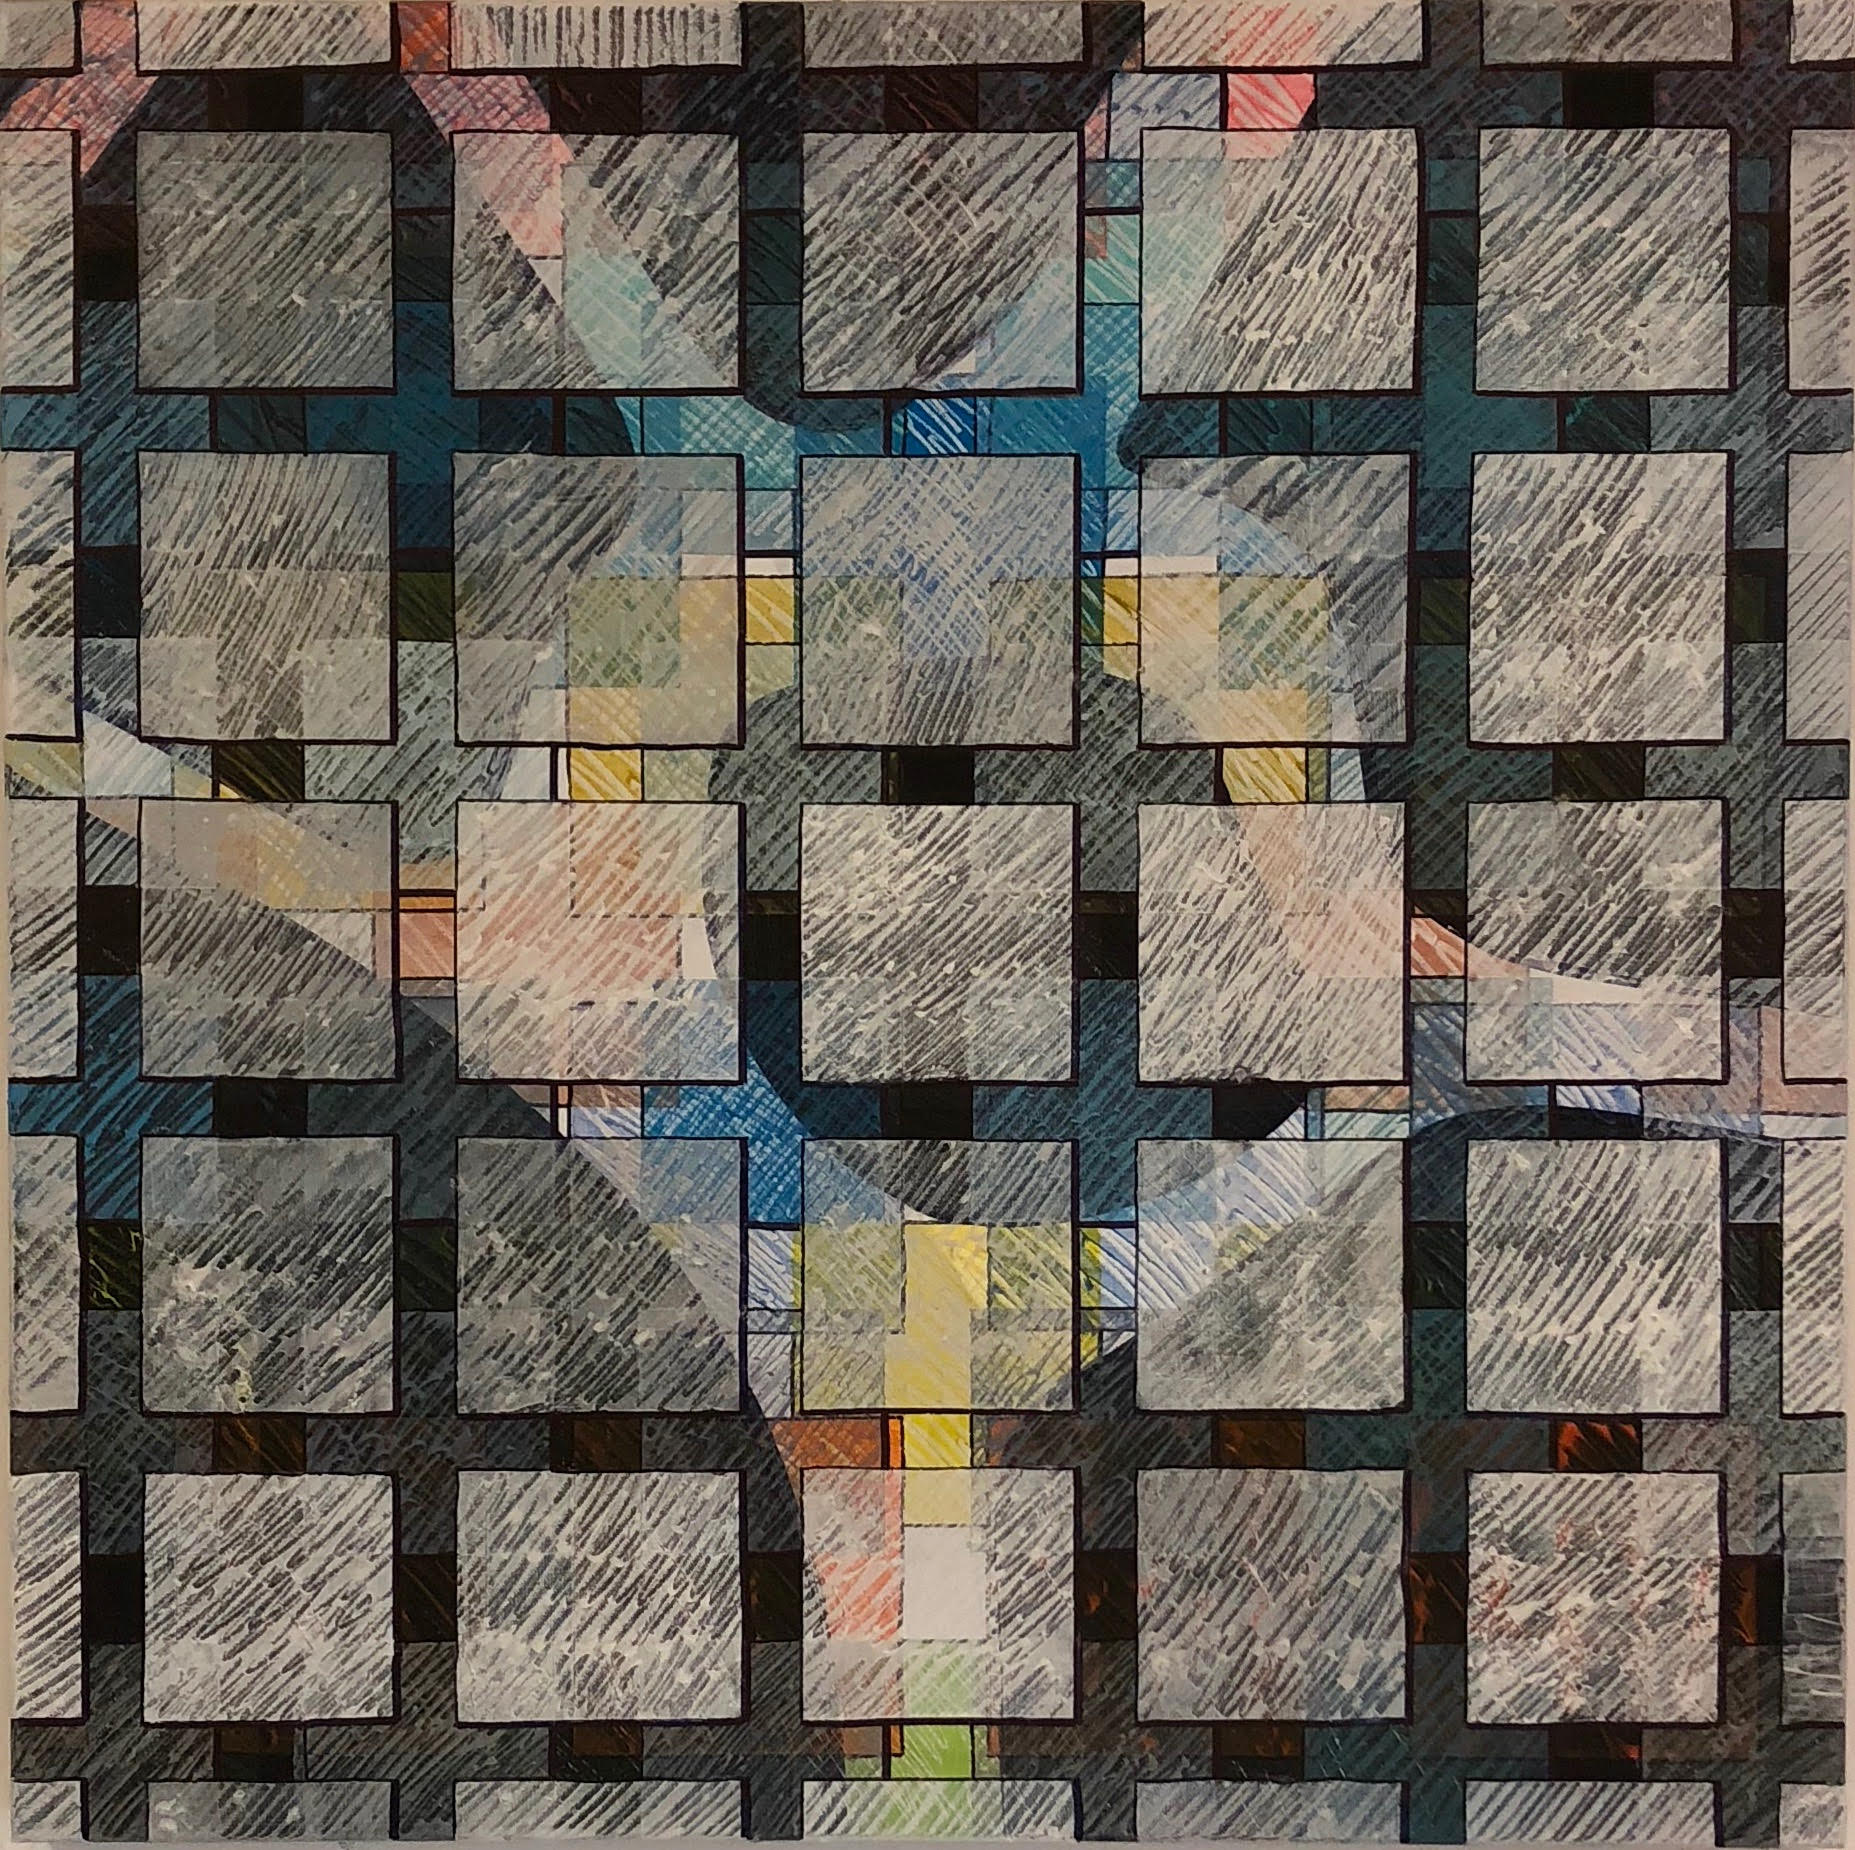 Elephant & Castle, 2018 | Mixed Media on Canvas | 80 x 80 cm | £750 (framed)